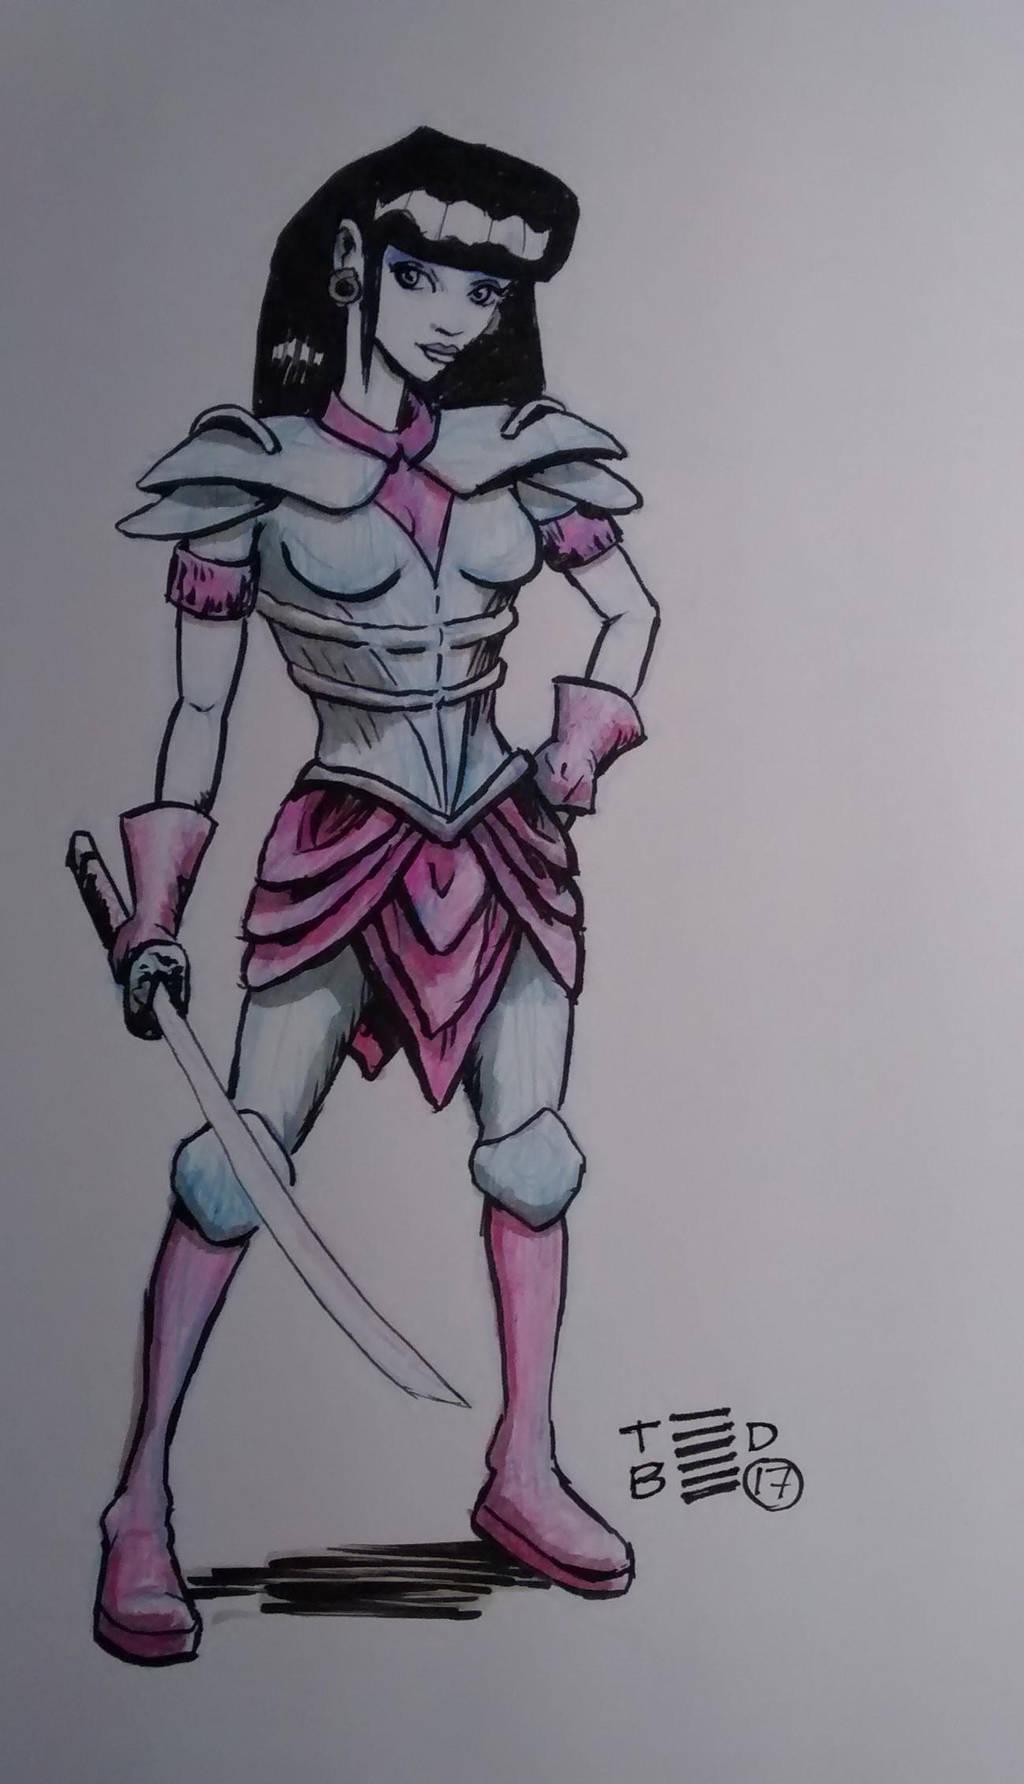 Warrior Woman by tedbergeron